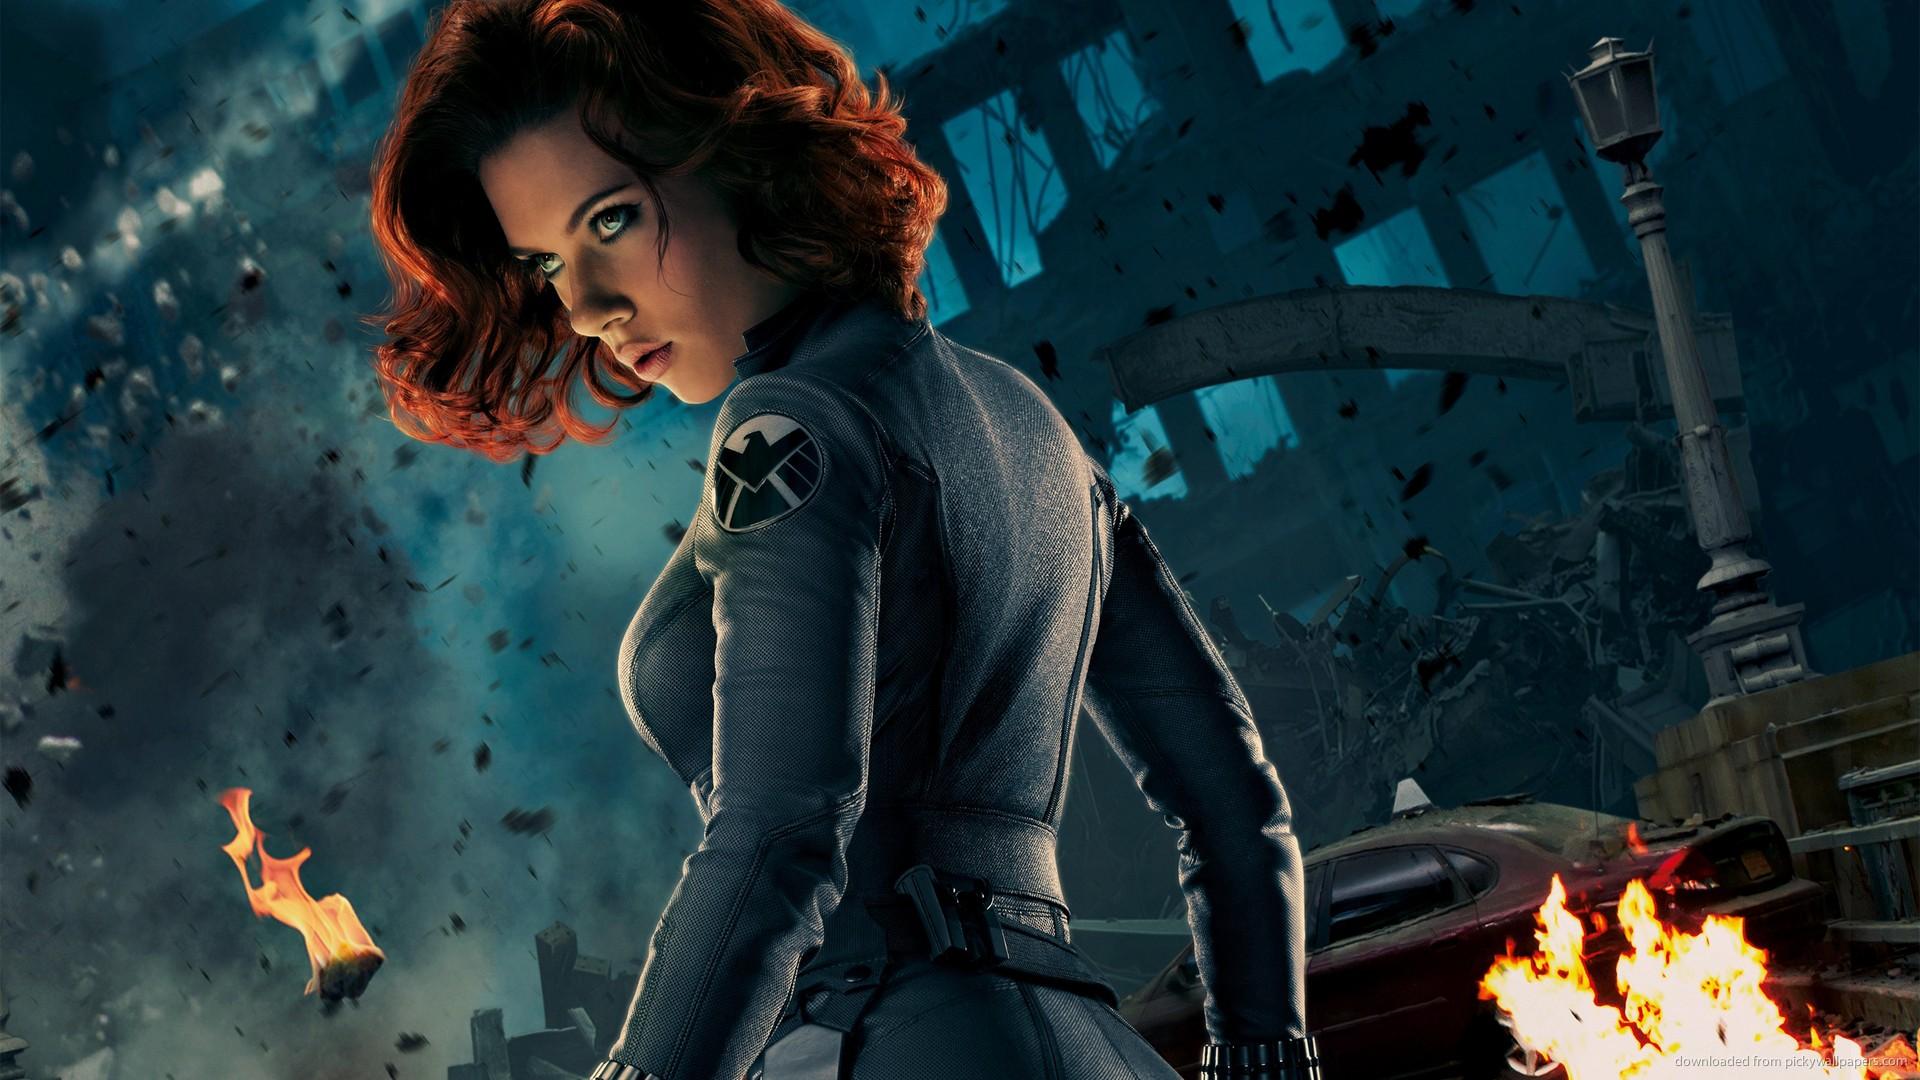 65 Scarlett Johansson Black Widow Wallpaper On Wallpapersafari